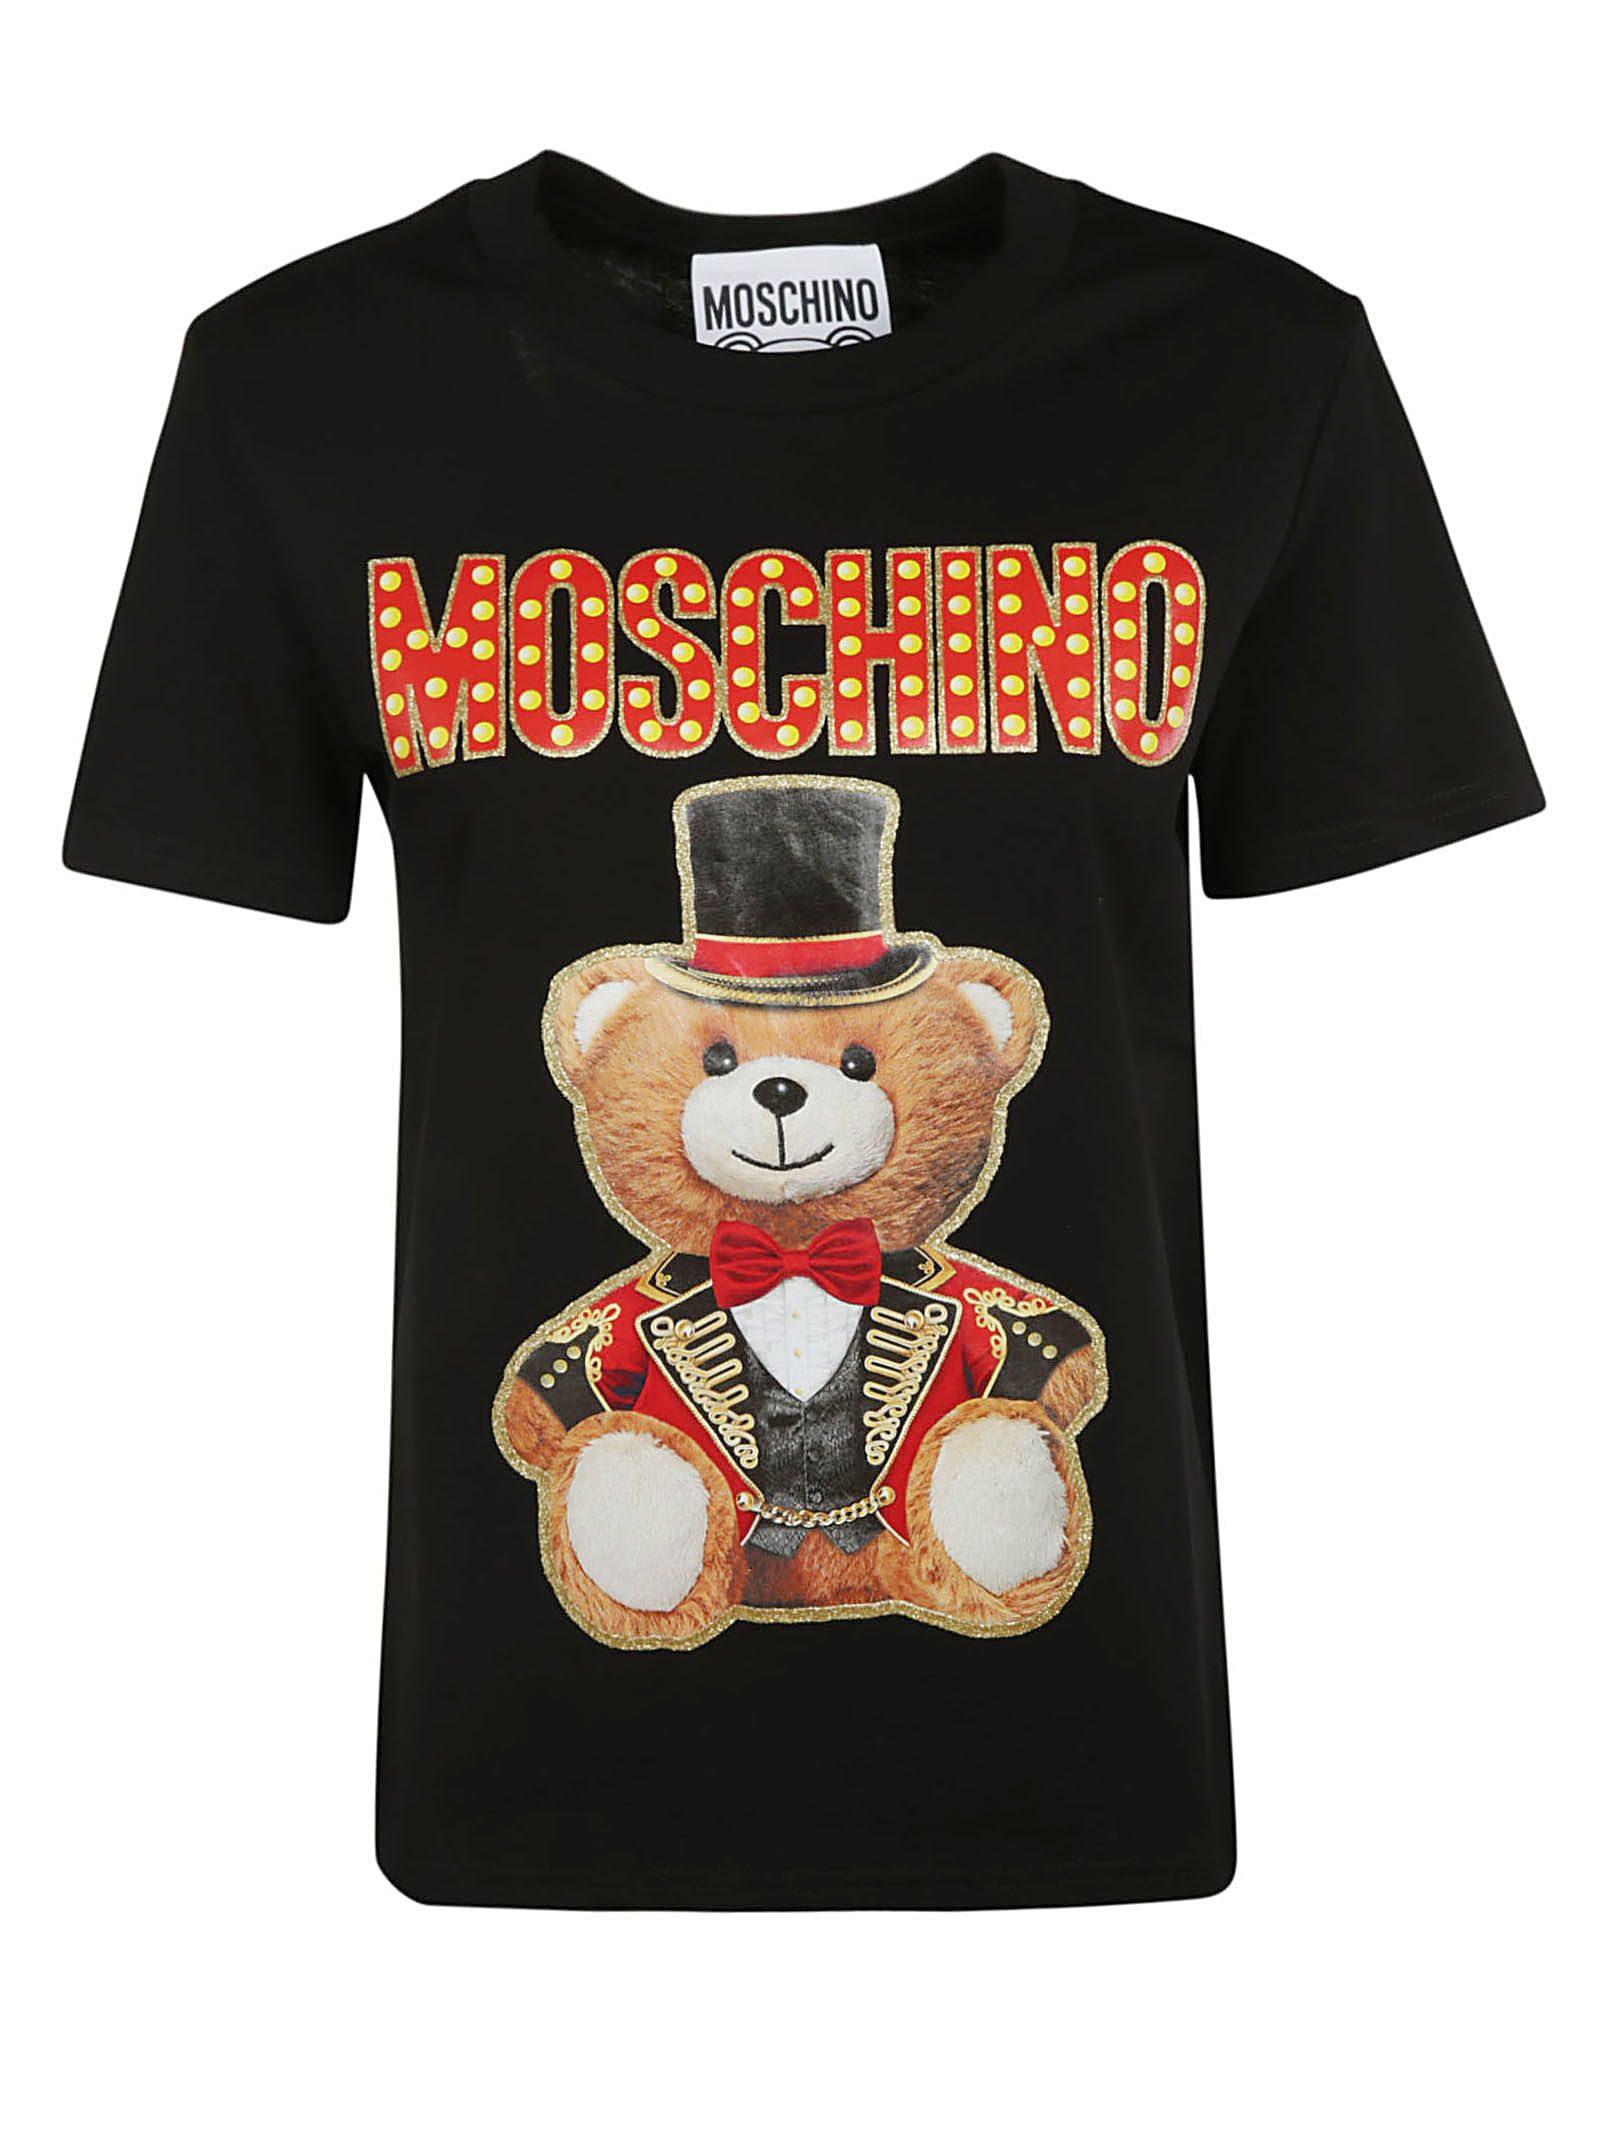 37408c093d21 Moschino Moschino Logo Teddy Bear T-shirt - Black - 10818441